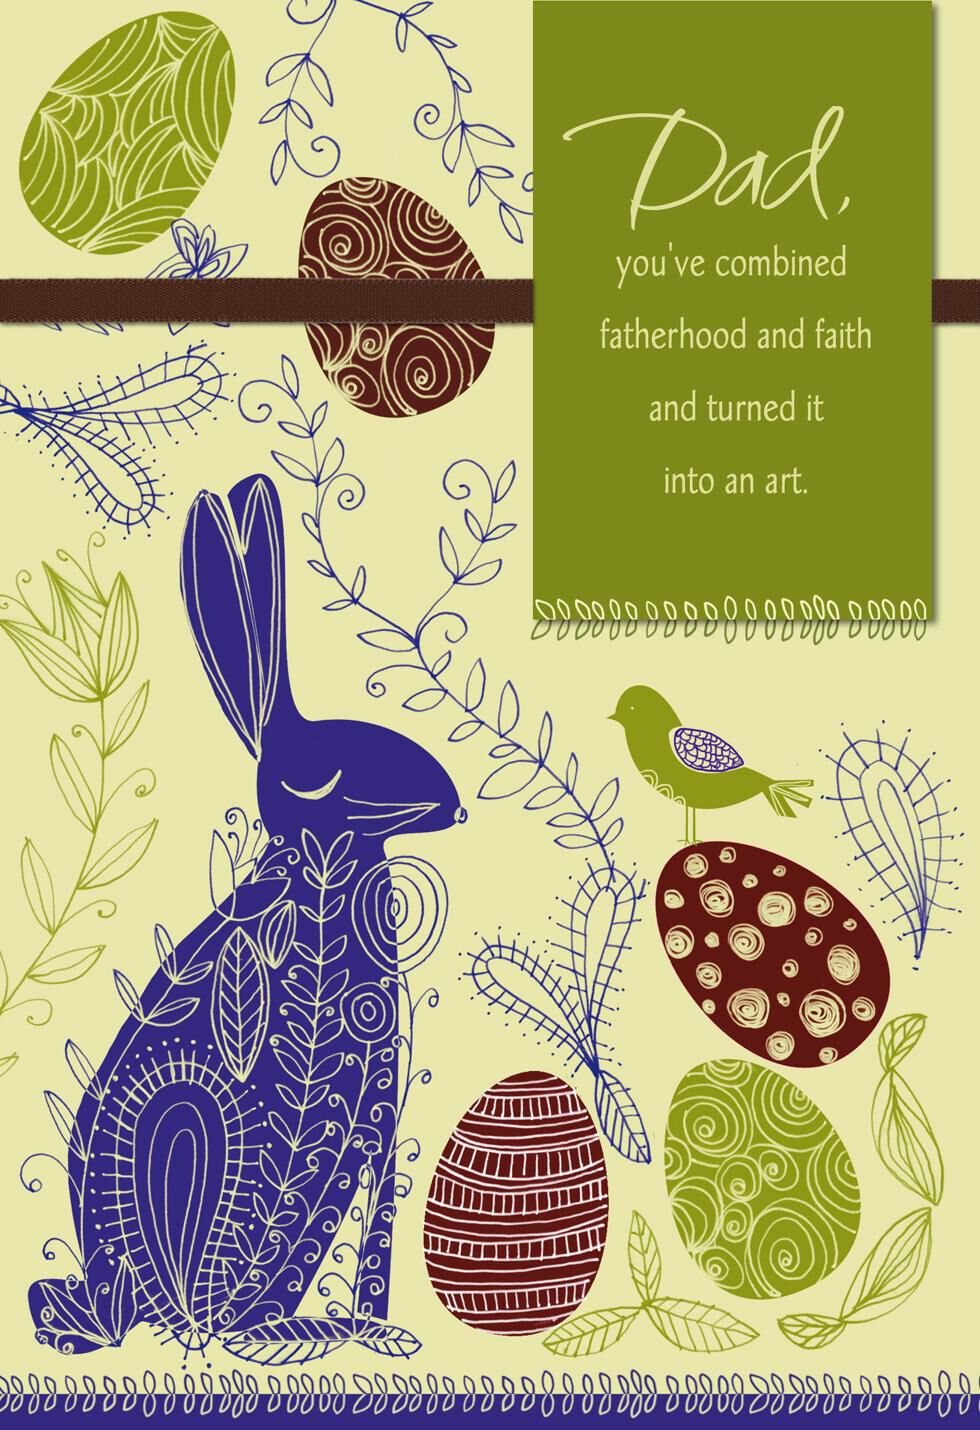 Bunny Fatherhood and Faith Easter Card for Dad Greeting Cards – Hallmark Easter Cards